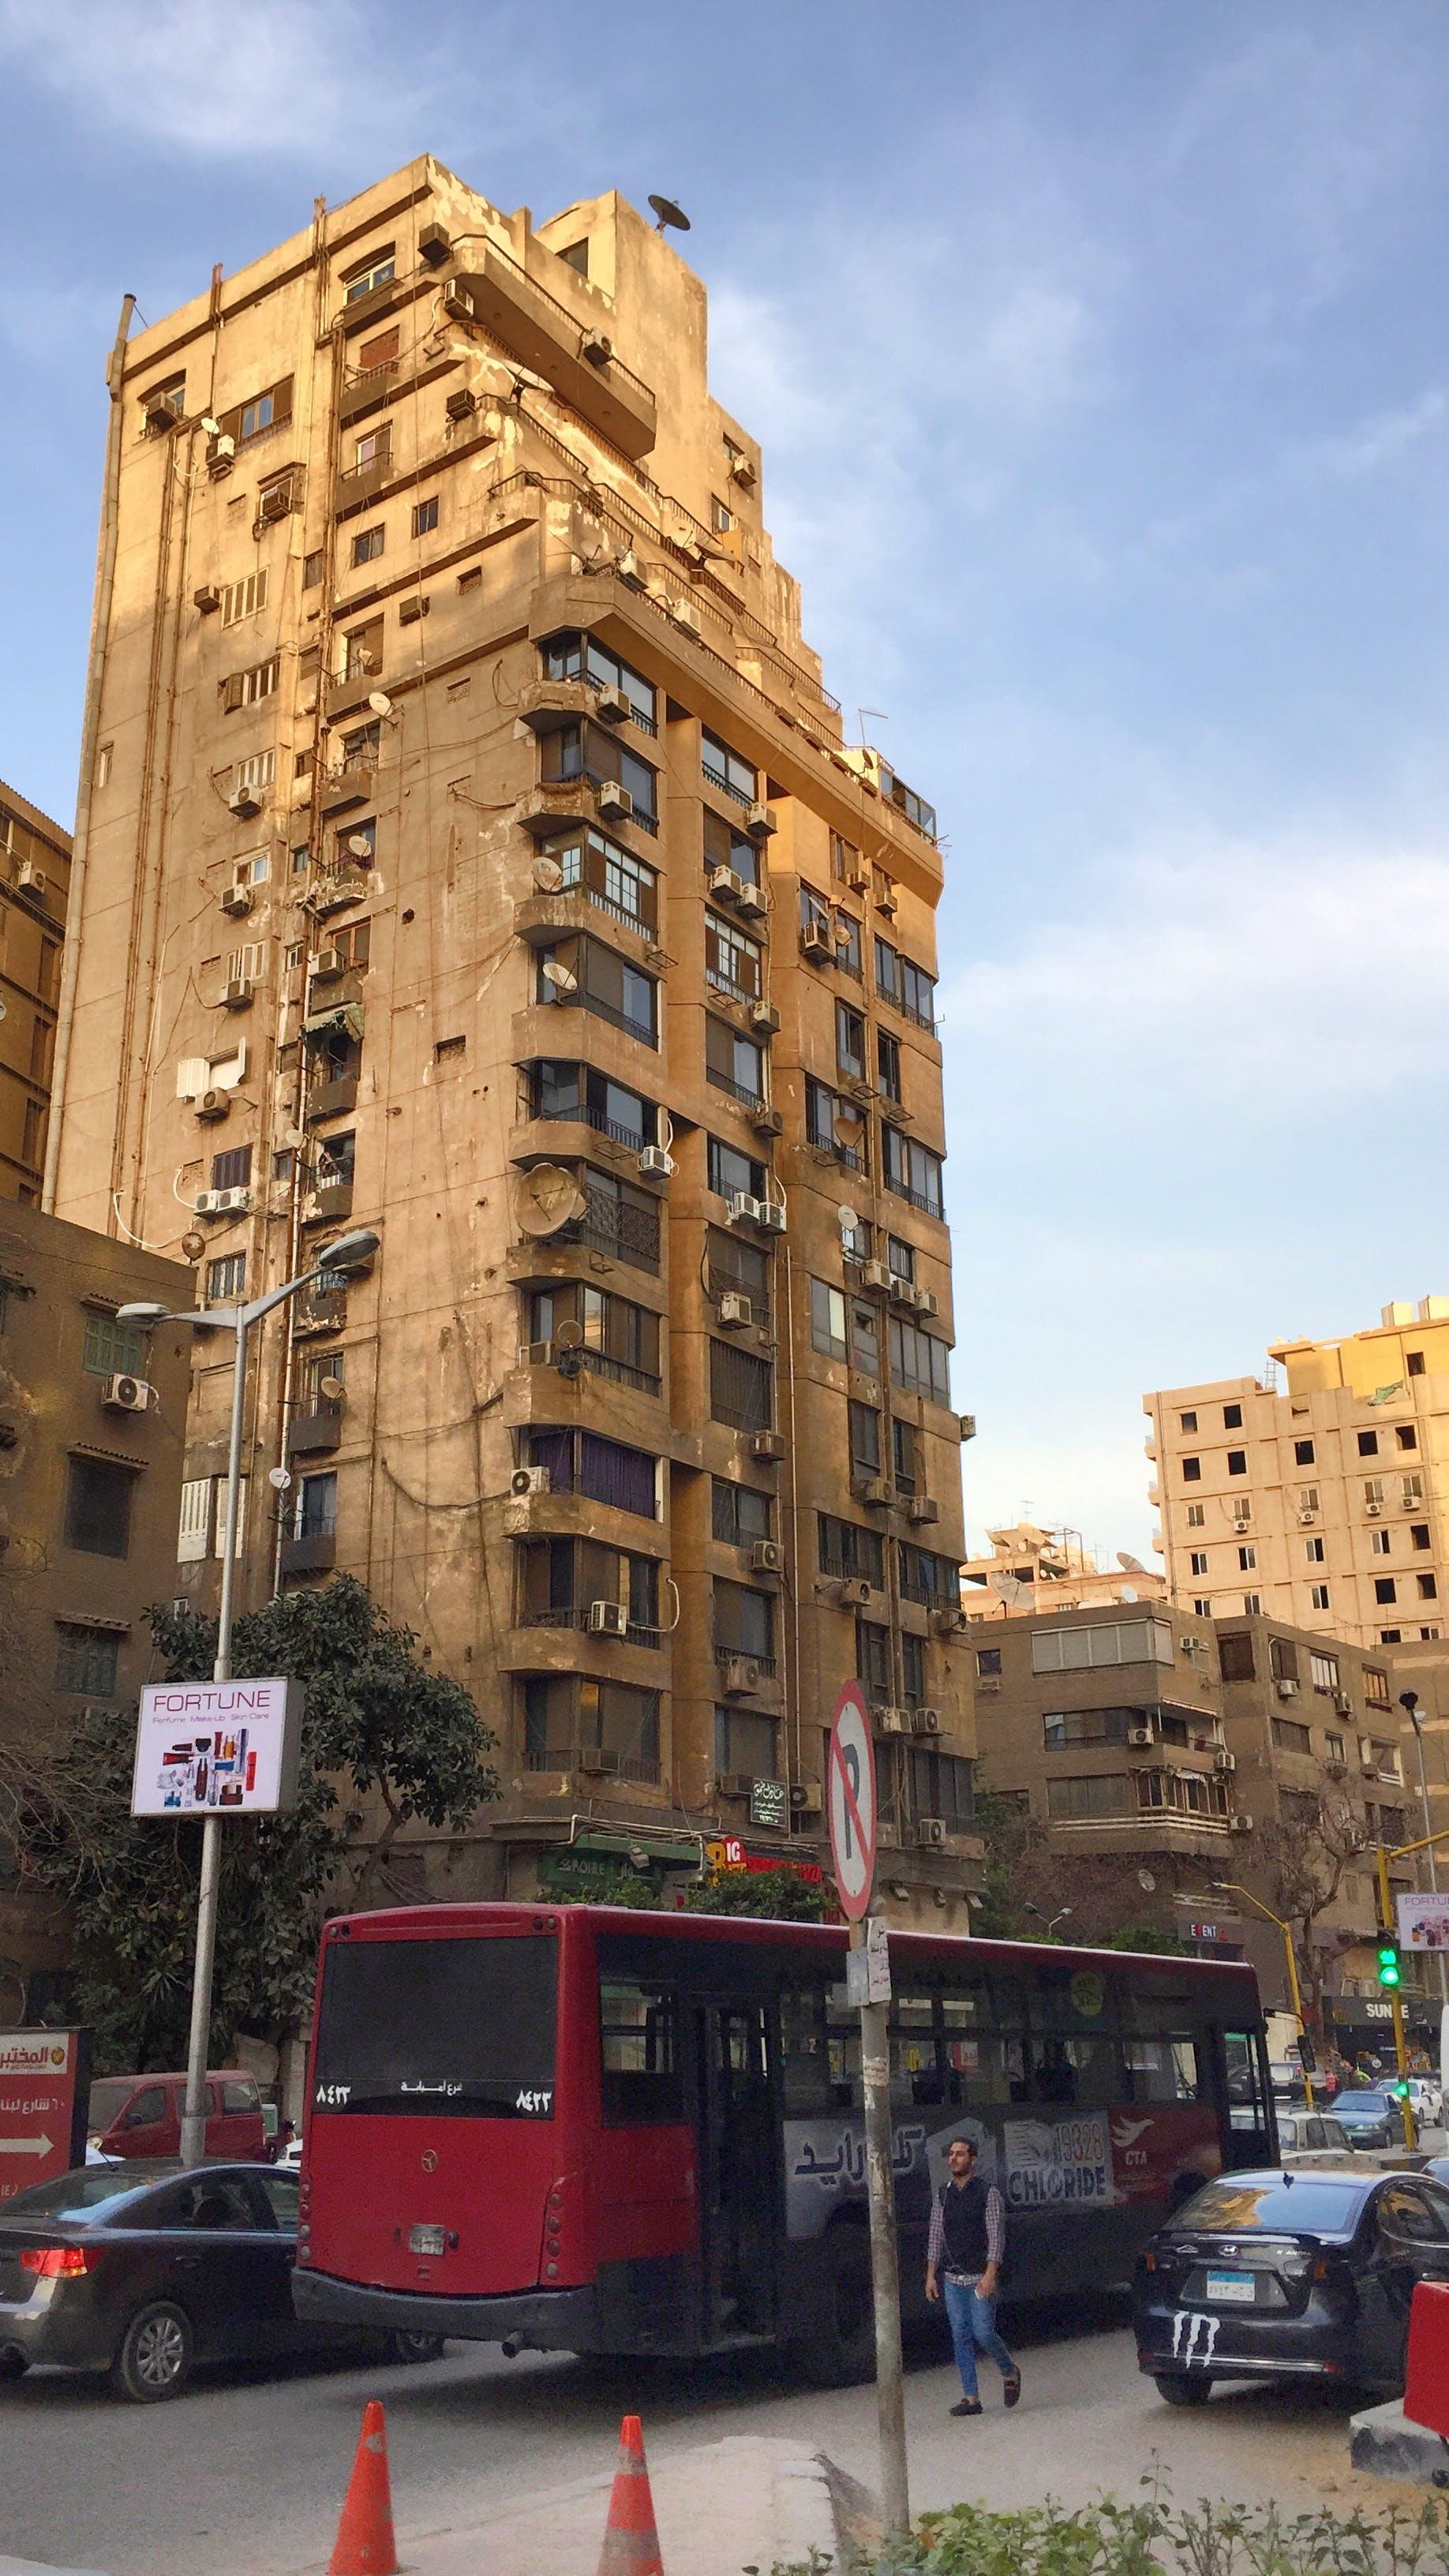 Free stock photo of bus, cairo, cars, city